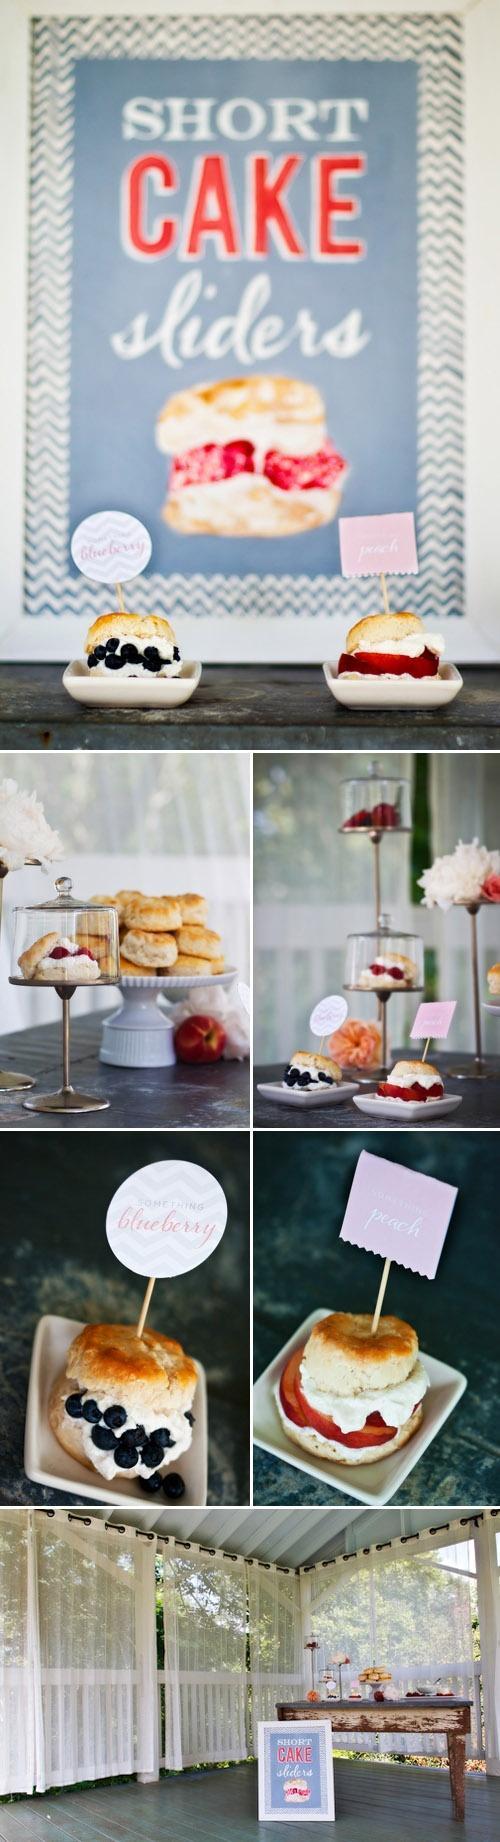 Wedding - Wedding Color Ideas & Inspiration Boards